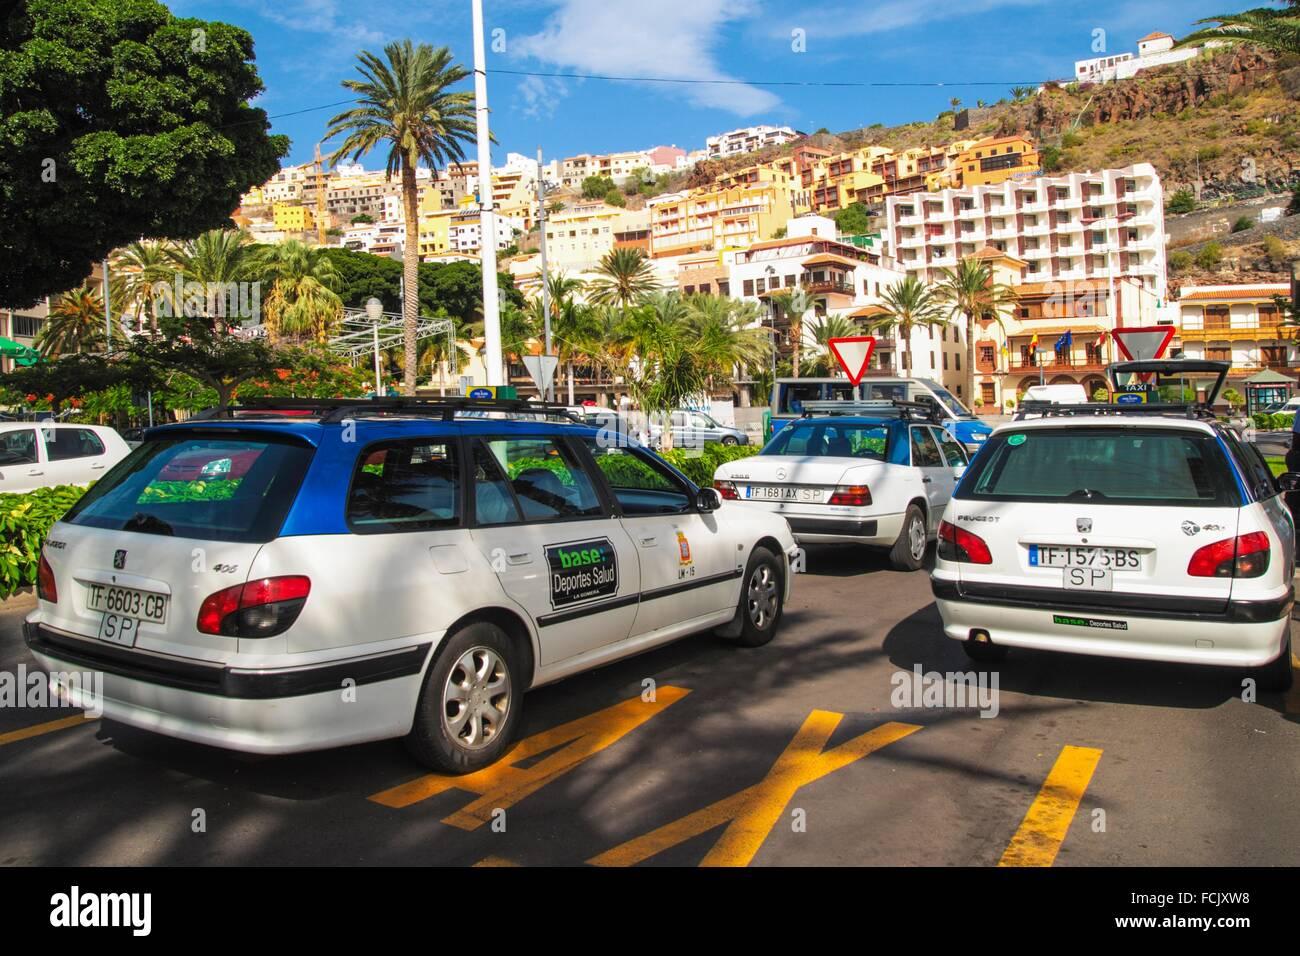 stationary Taxis in San Sebastian de La Gomera. Canary islands. - Stock Image